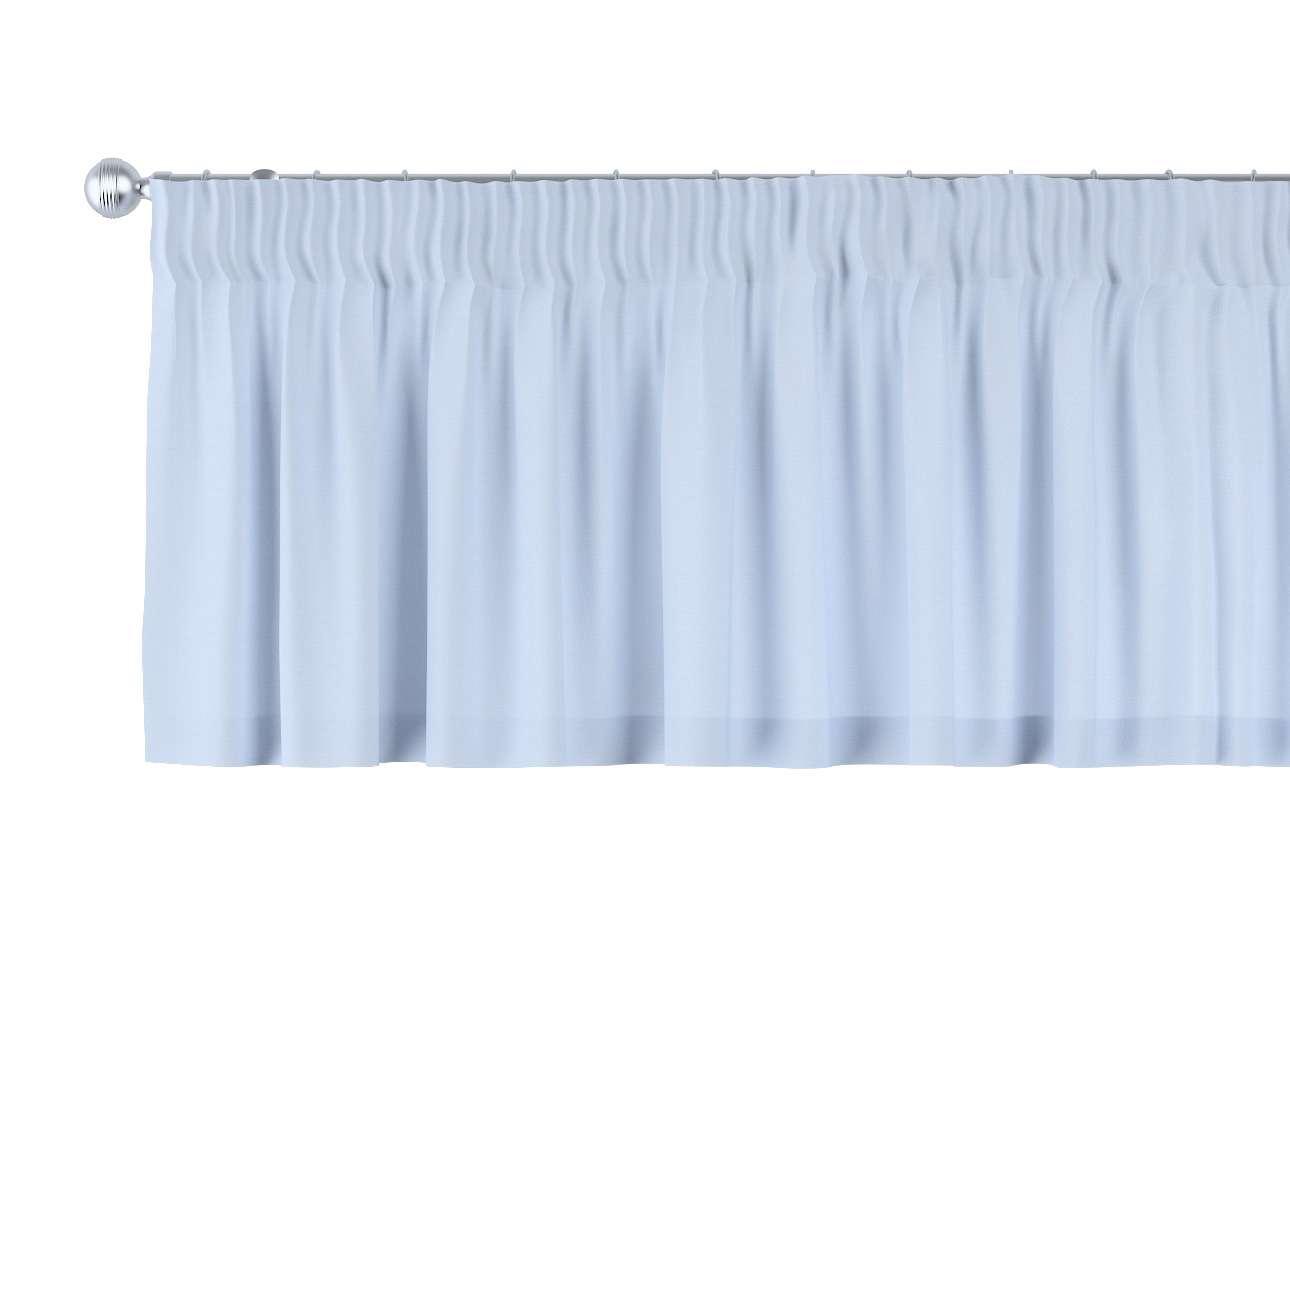 Kurzgardine mit Kräuselband von der Kollektion Loneta, Stoff: 133-35